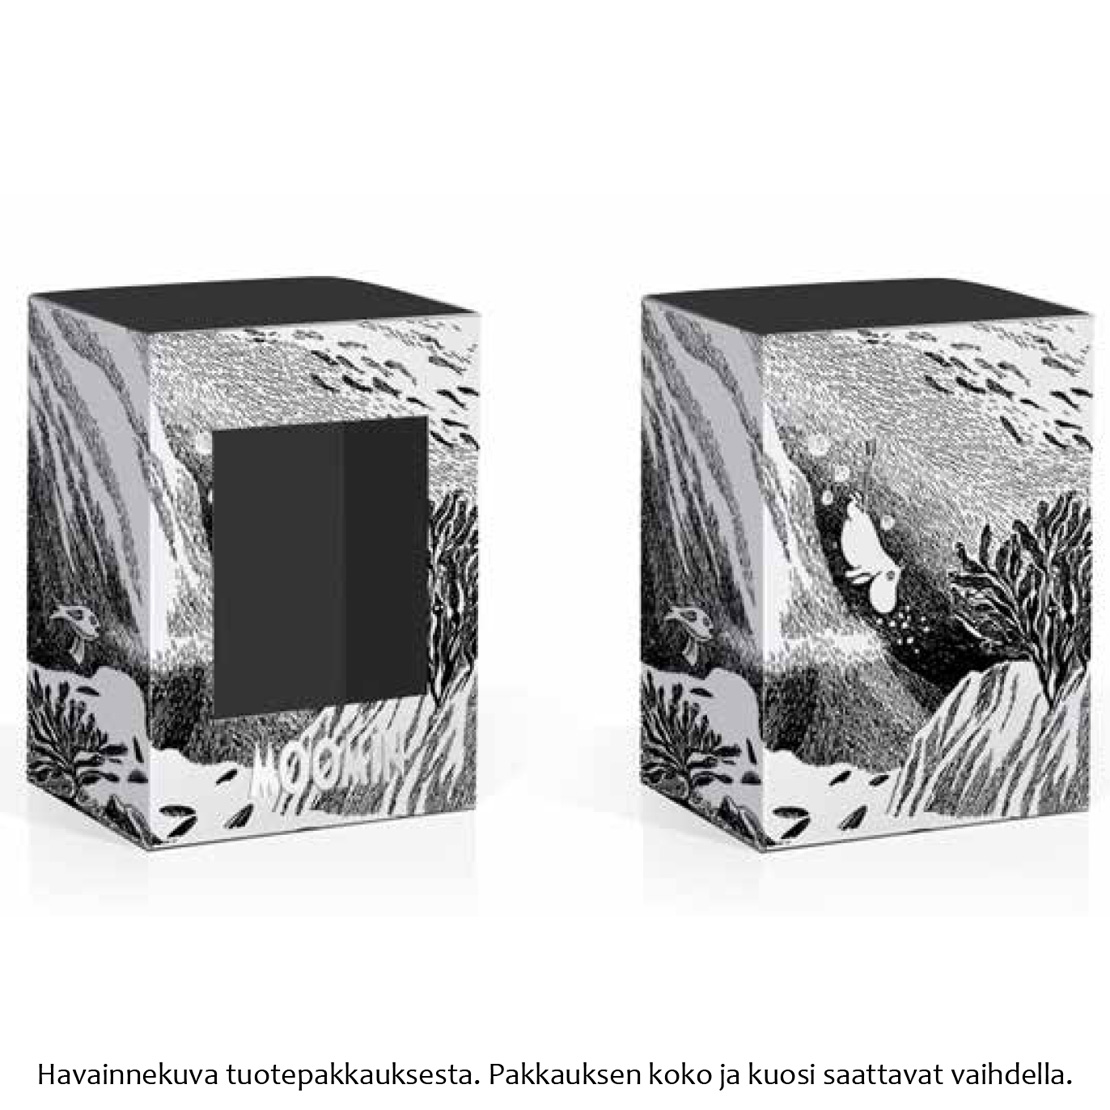 ... Moomin kaulakoru Niiskuneiti teräs Palaa edelliselle sivulle. lightbox  · lightbox 6e5d4bb66c